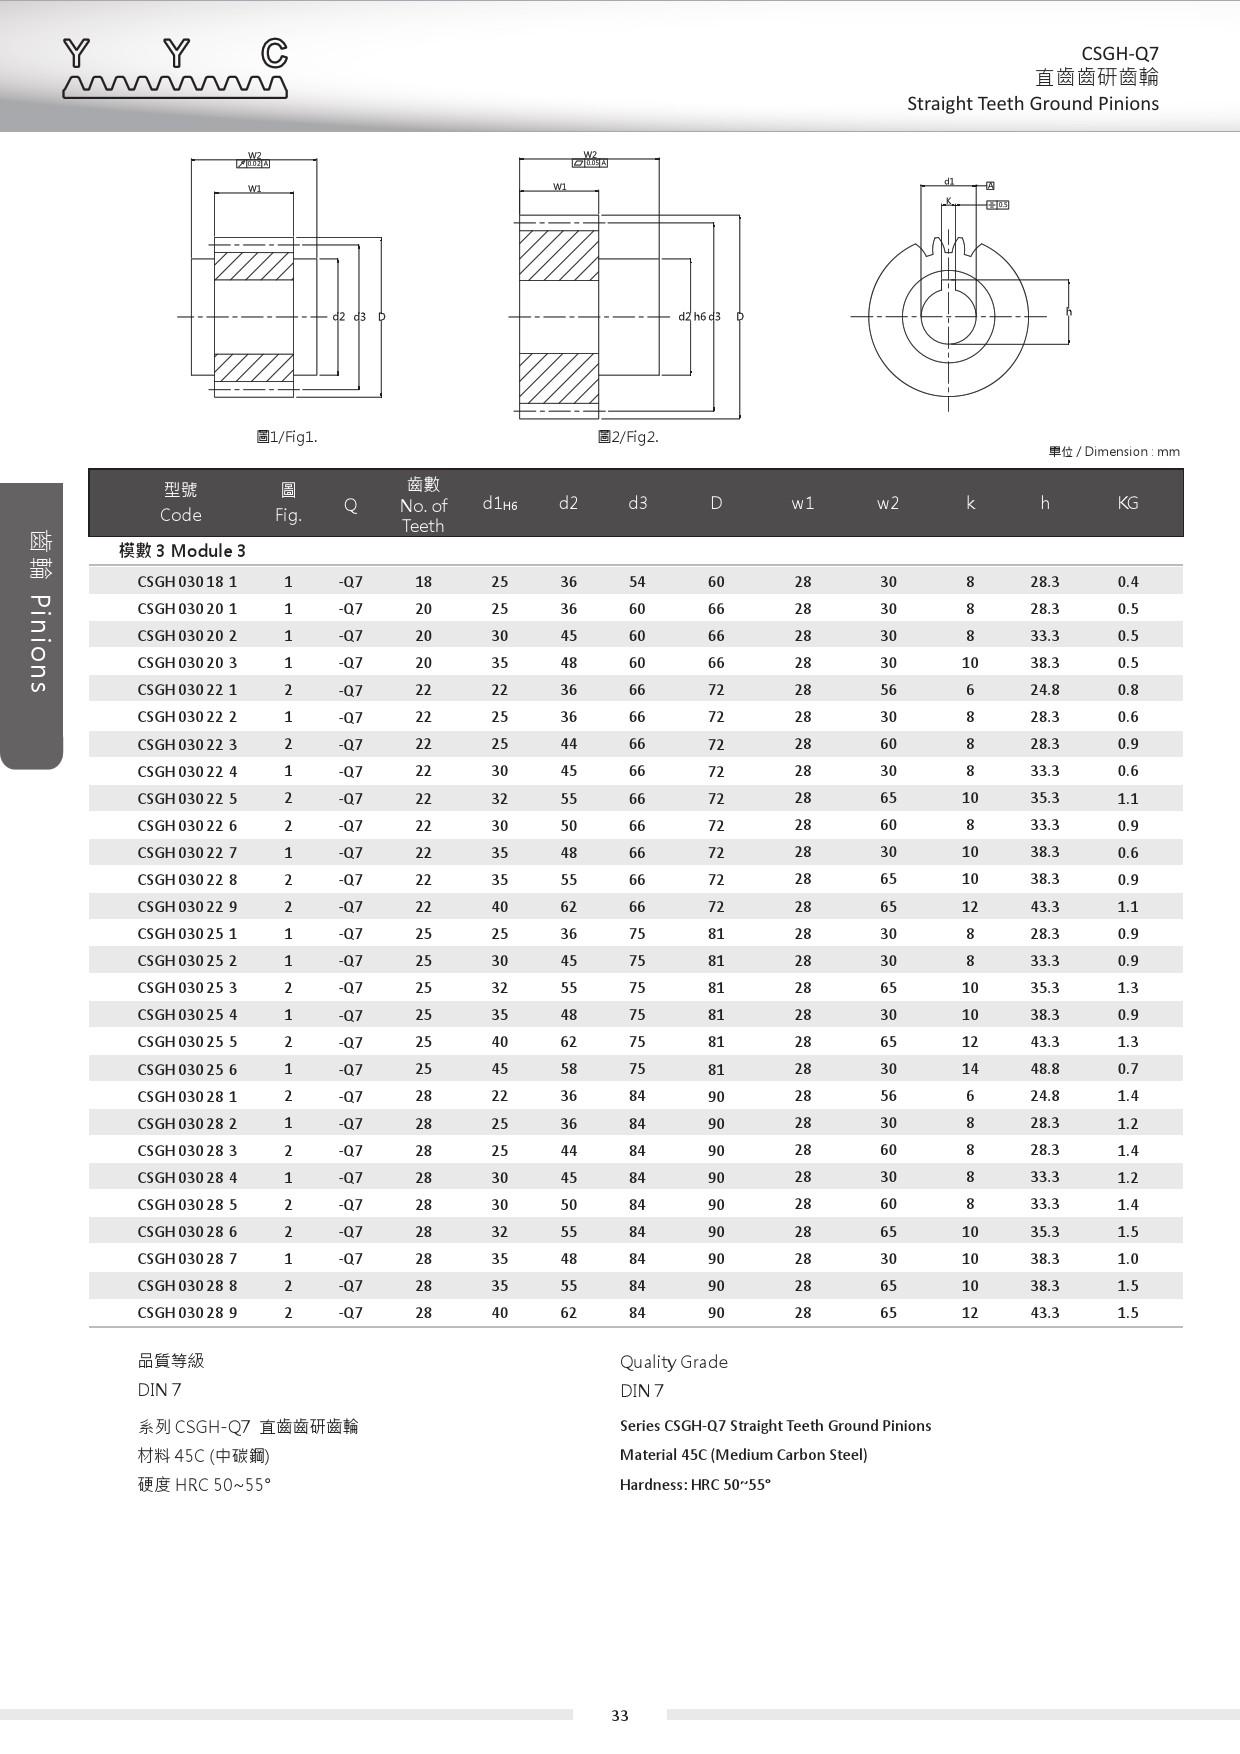 CSGH-Q7-3 直齒齒研齒輪